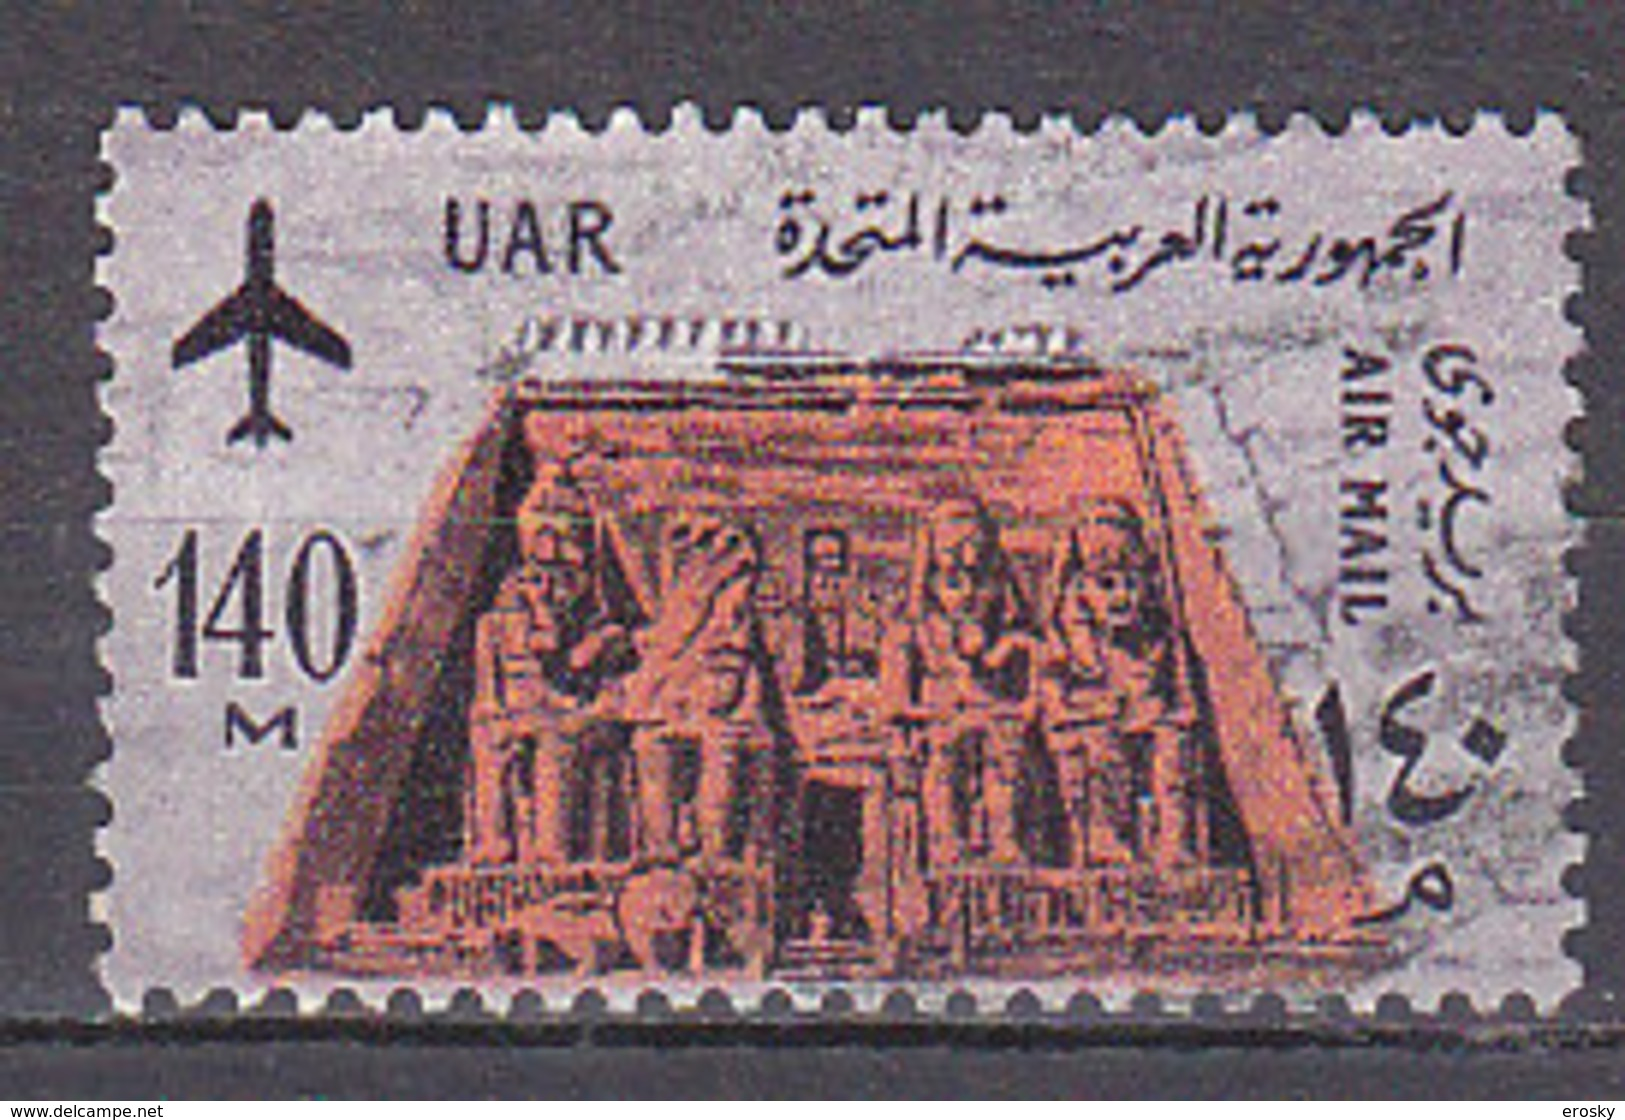 A0794 - EGYPTE EGYPT AERIENNE Yv N°94 - Poste Aérienne